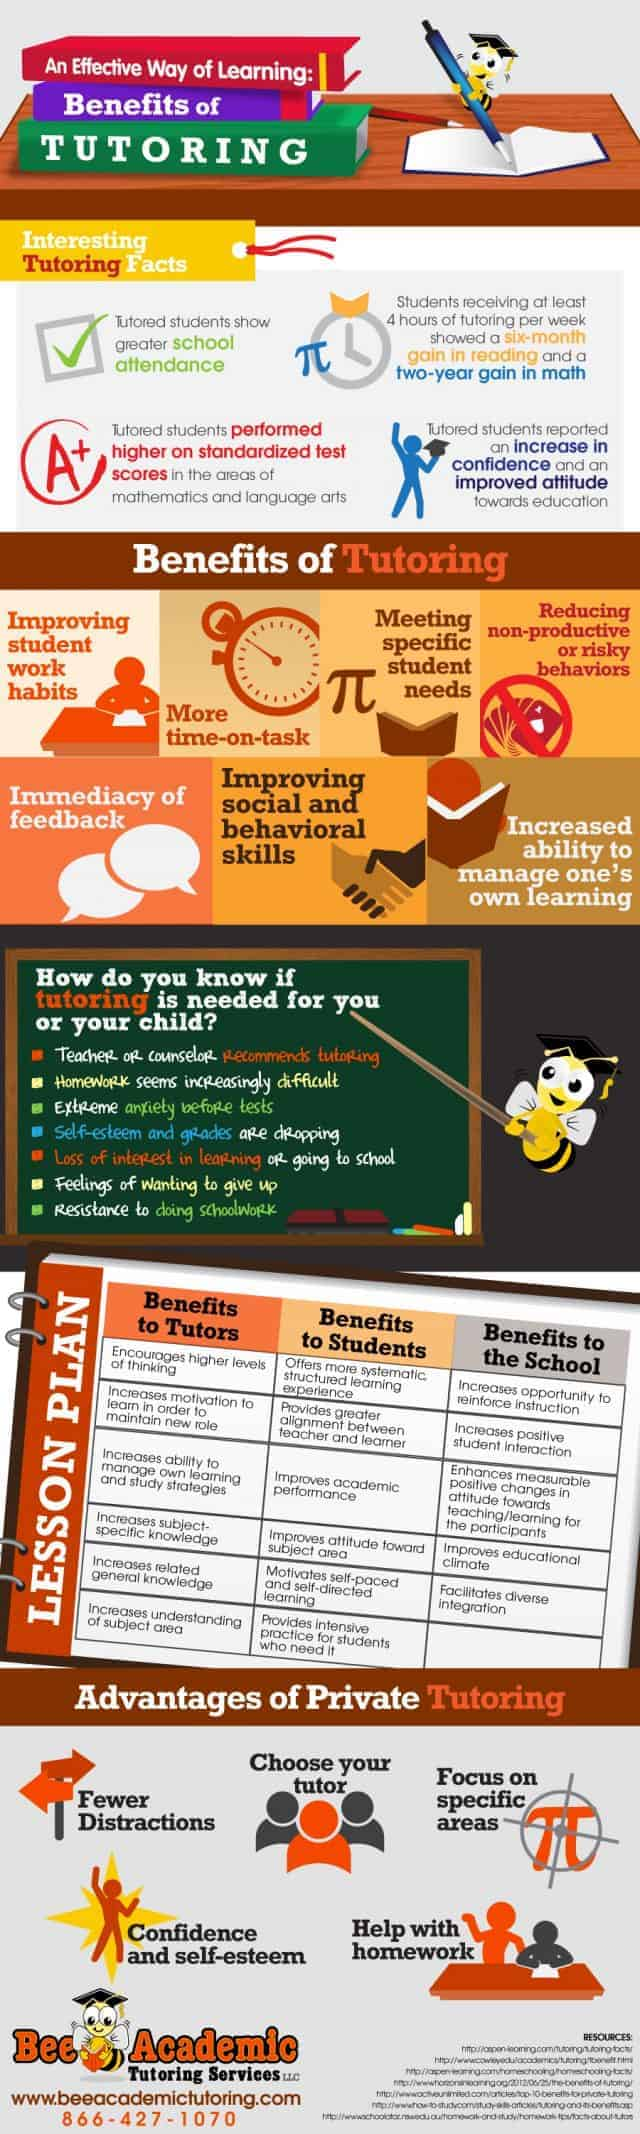 tutoring-infographic